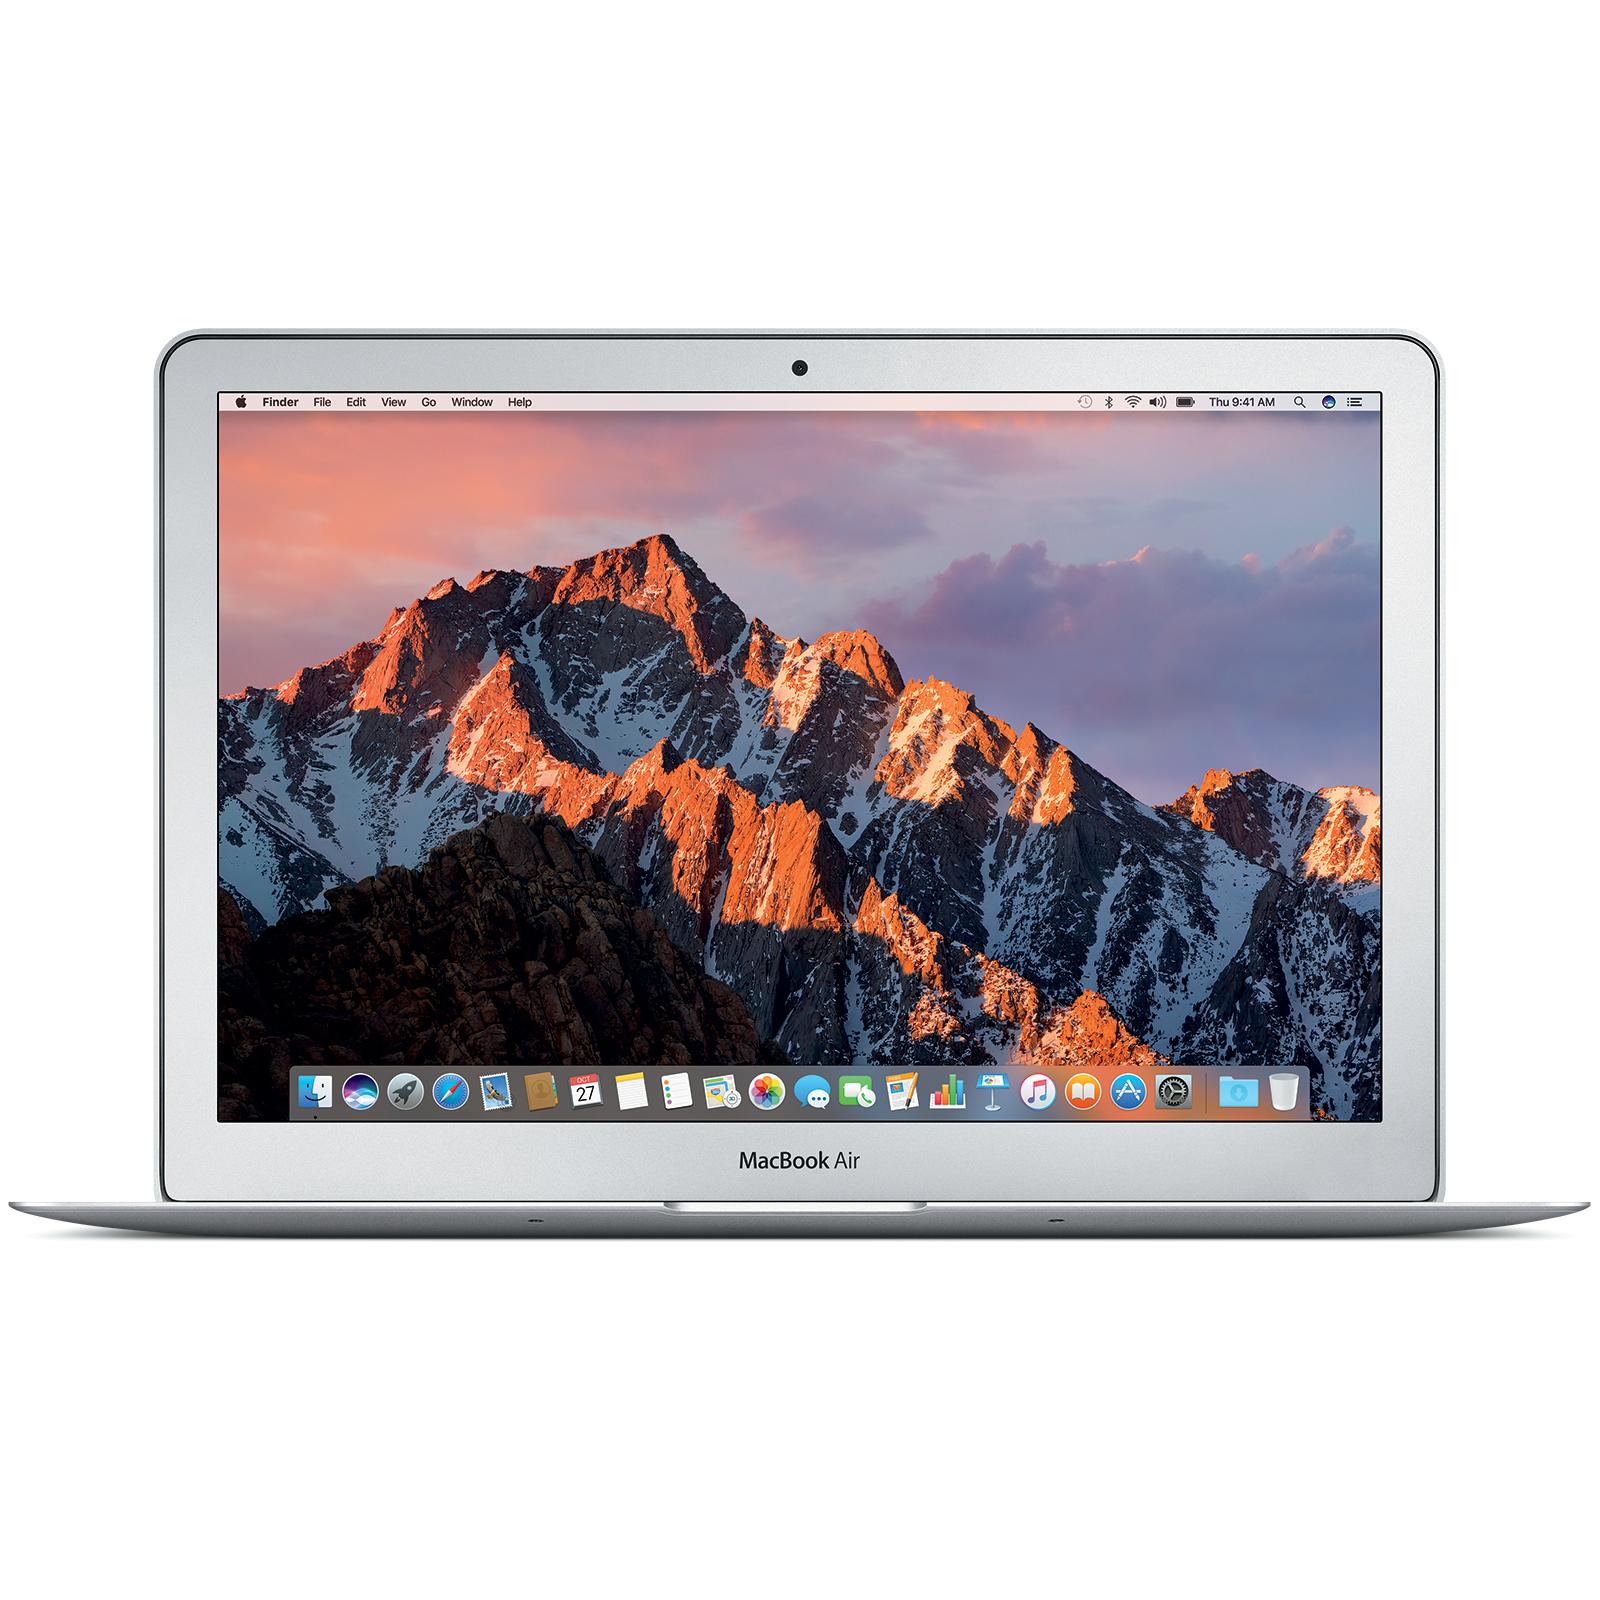 "PC Portable 13.3"" Apple MacBook Air MQD32FN - 1440 x 900, i5, RAM 8 Go, SSD 128 Go, QWERTY (eGlobal Central)"